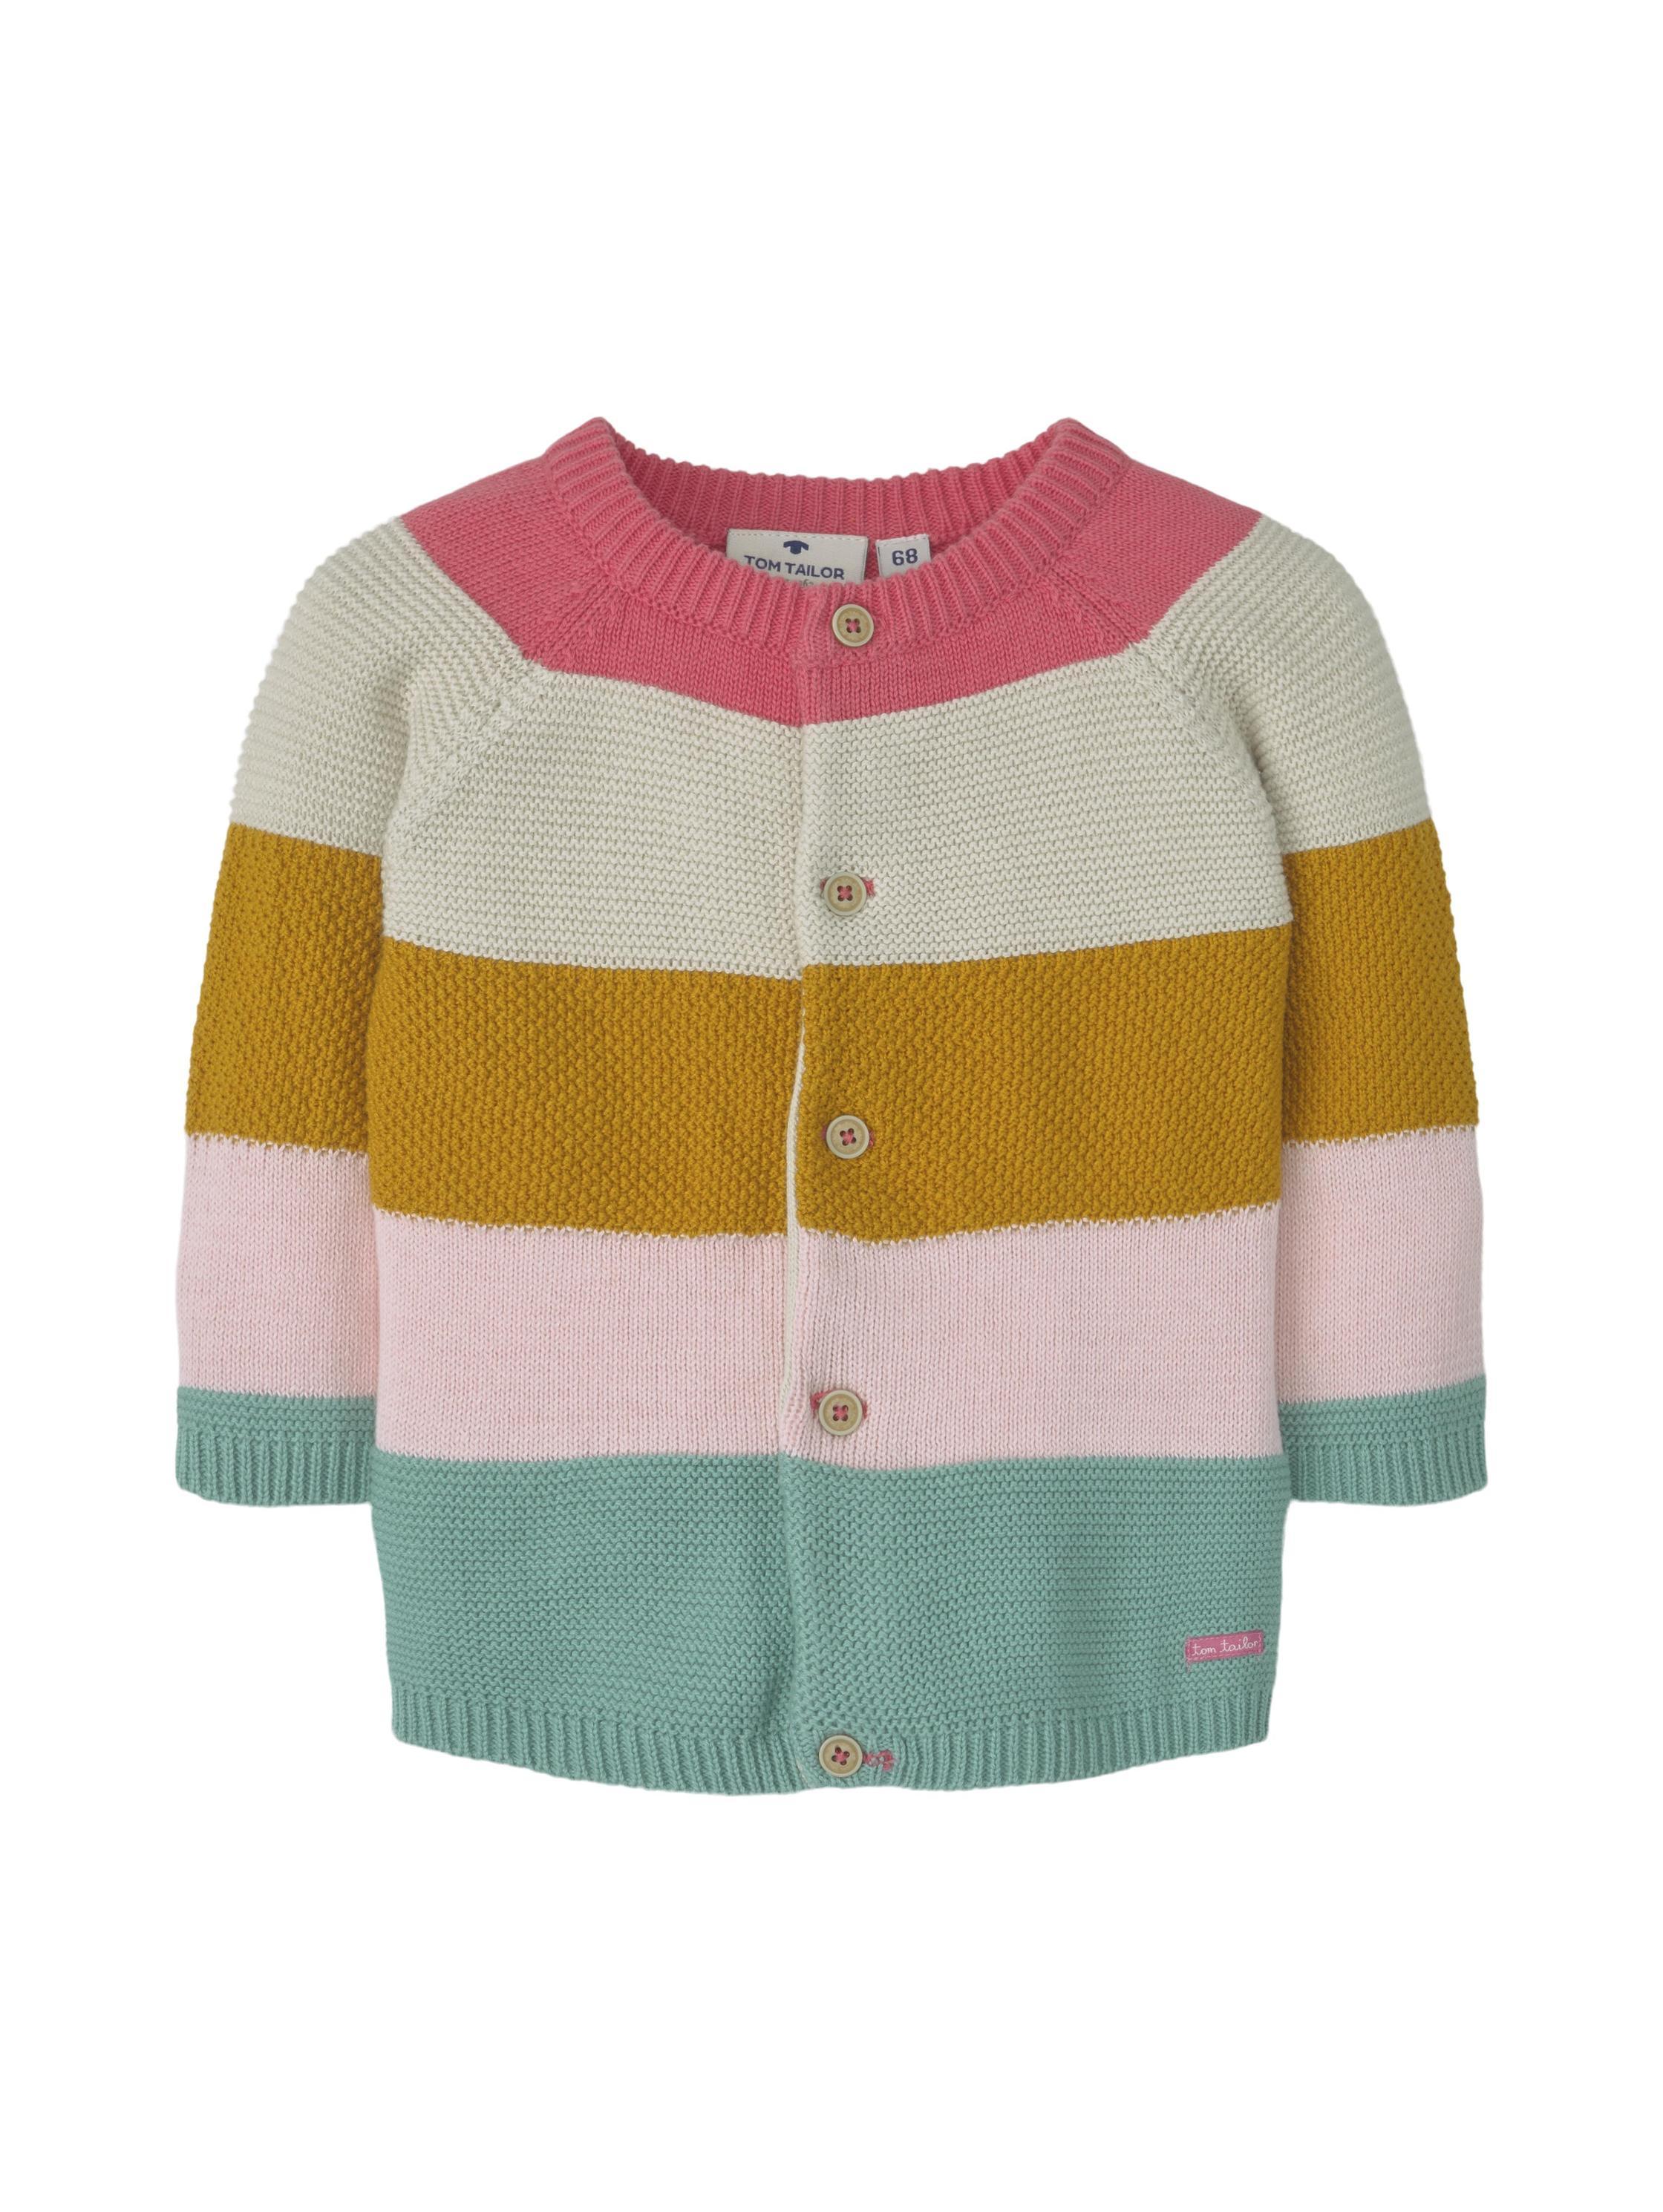 knit cardigan striped, original-multicolored